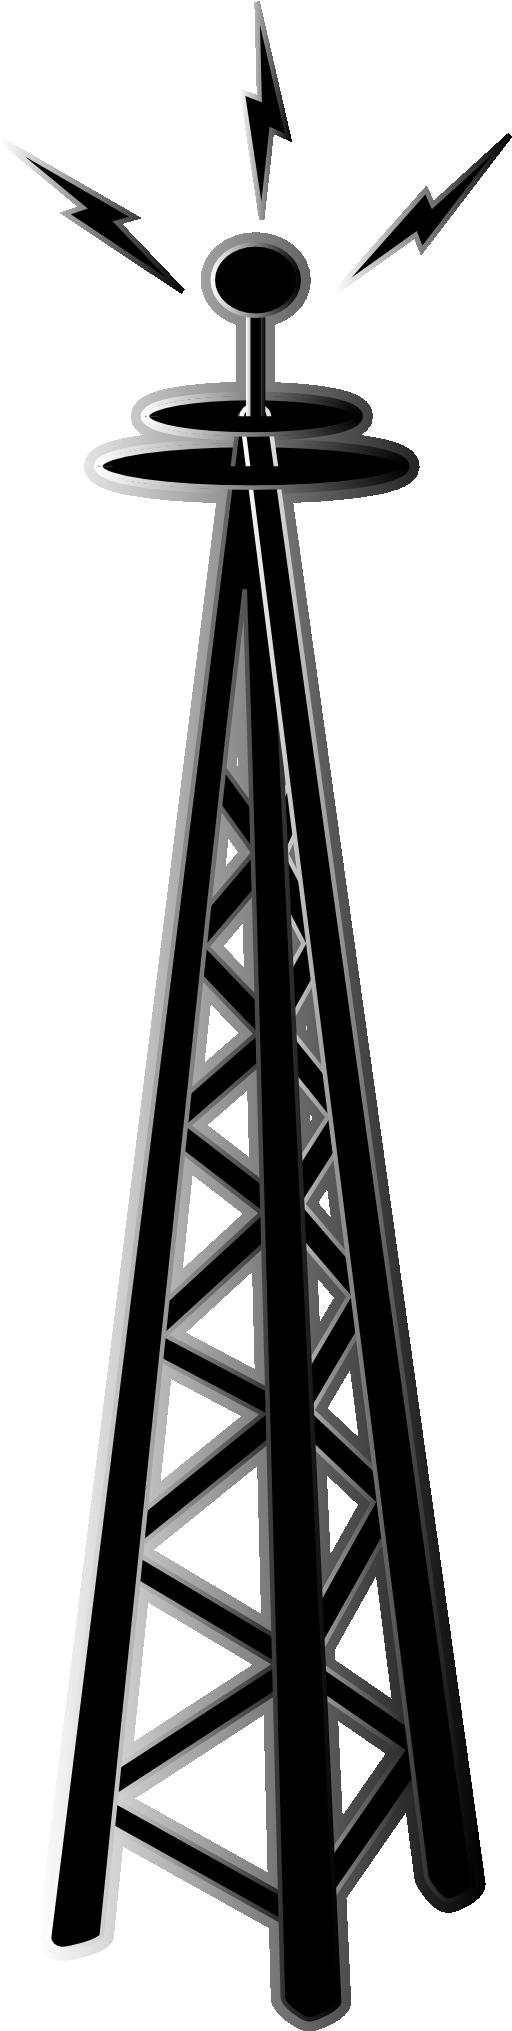 Transmission Tower Icon .-Transmission Tower Icon .-13